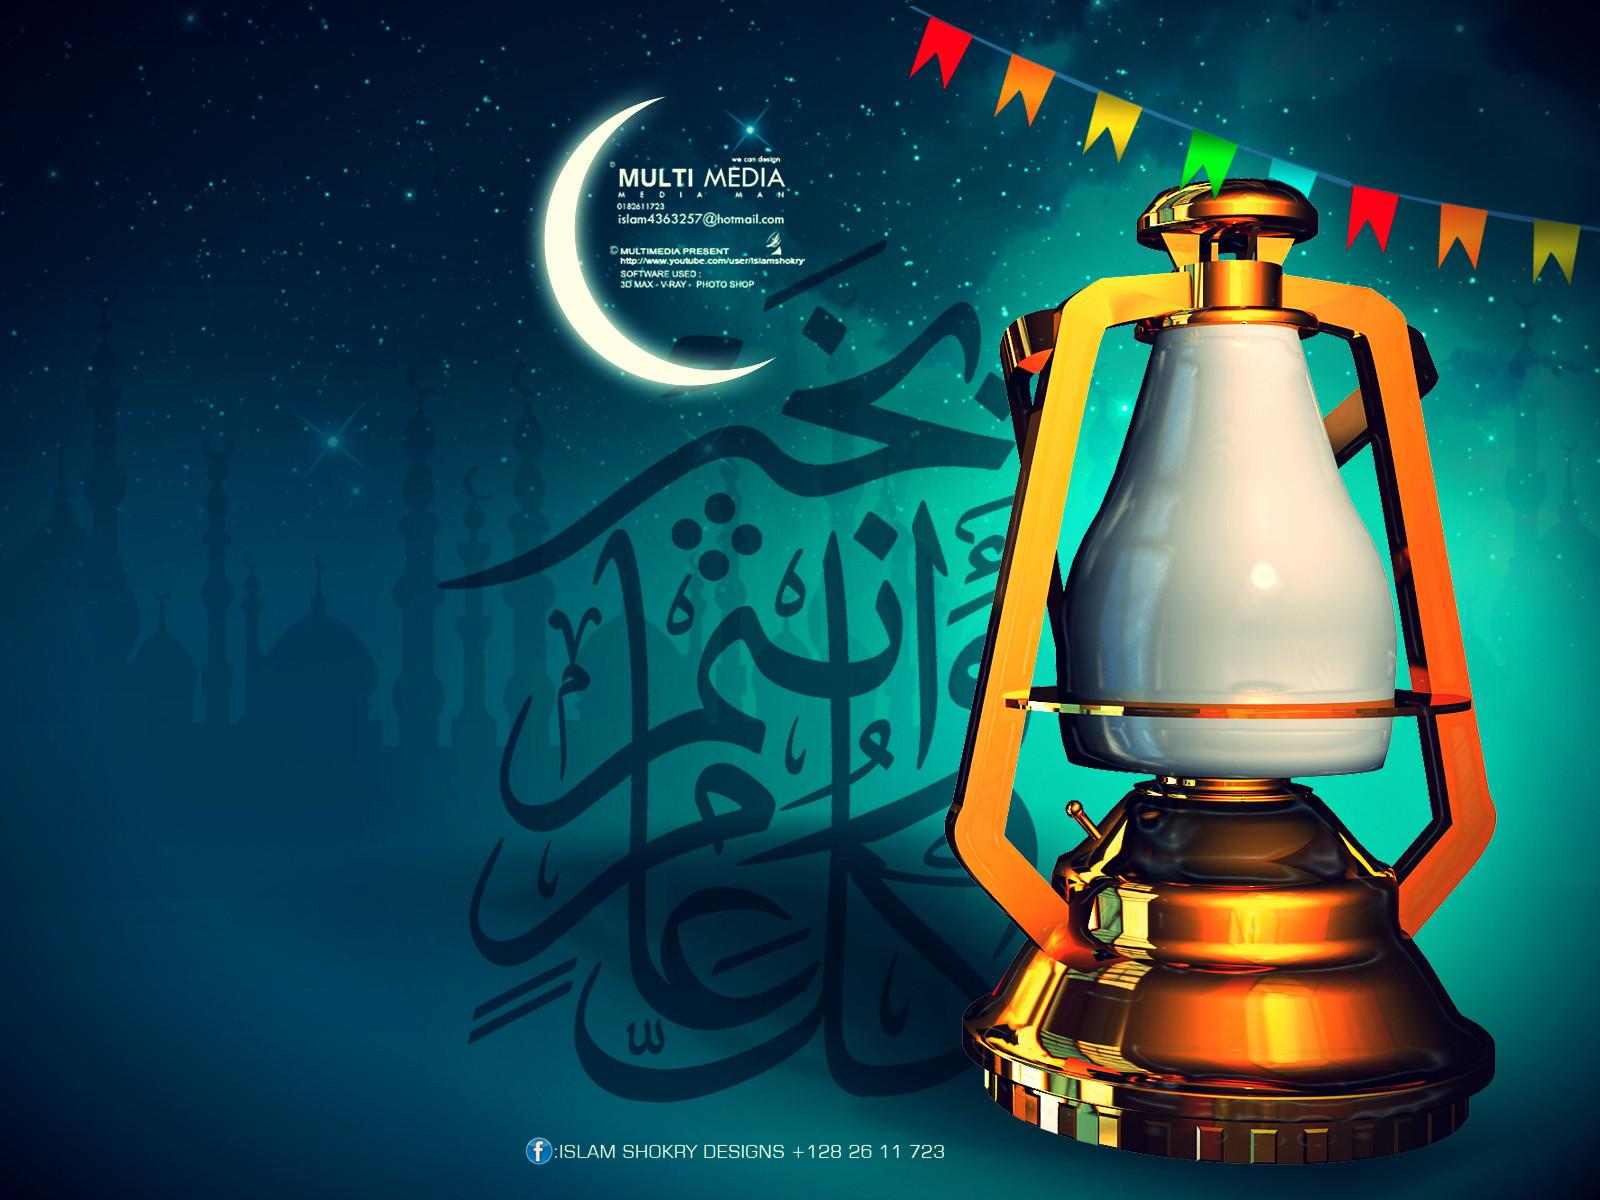 صور رمضان 2020 أجمل صور فوانيس رمضان 2021 بطاقات تهنئة لرمضان تهنئة رمضان بالأسماء 11